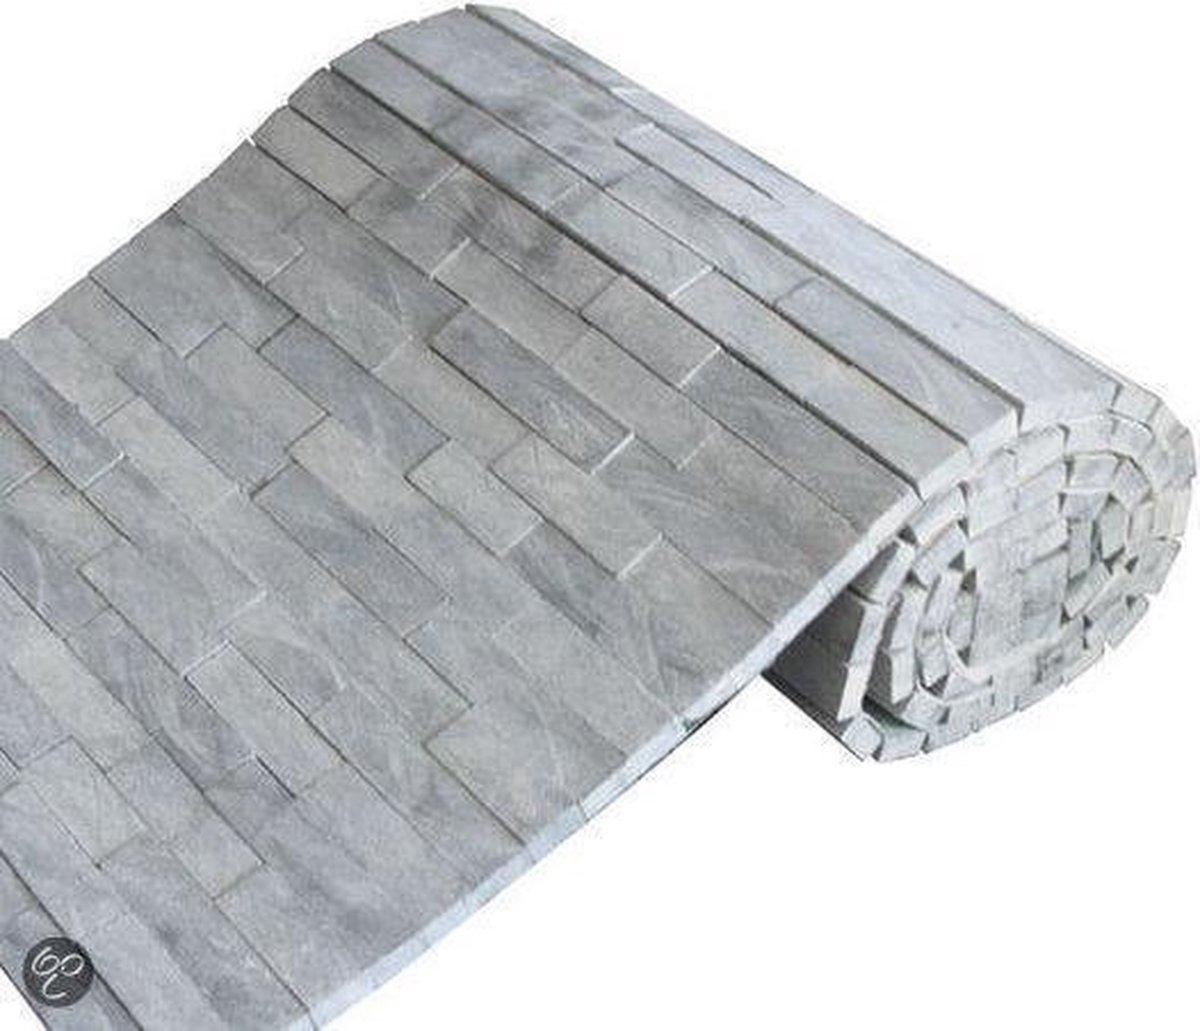 Mozaiek Brickstone rol dark-grey 34,0x150,0 cm -  Grijs Prijs per 1 rol. - max4home